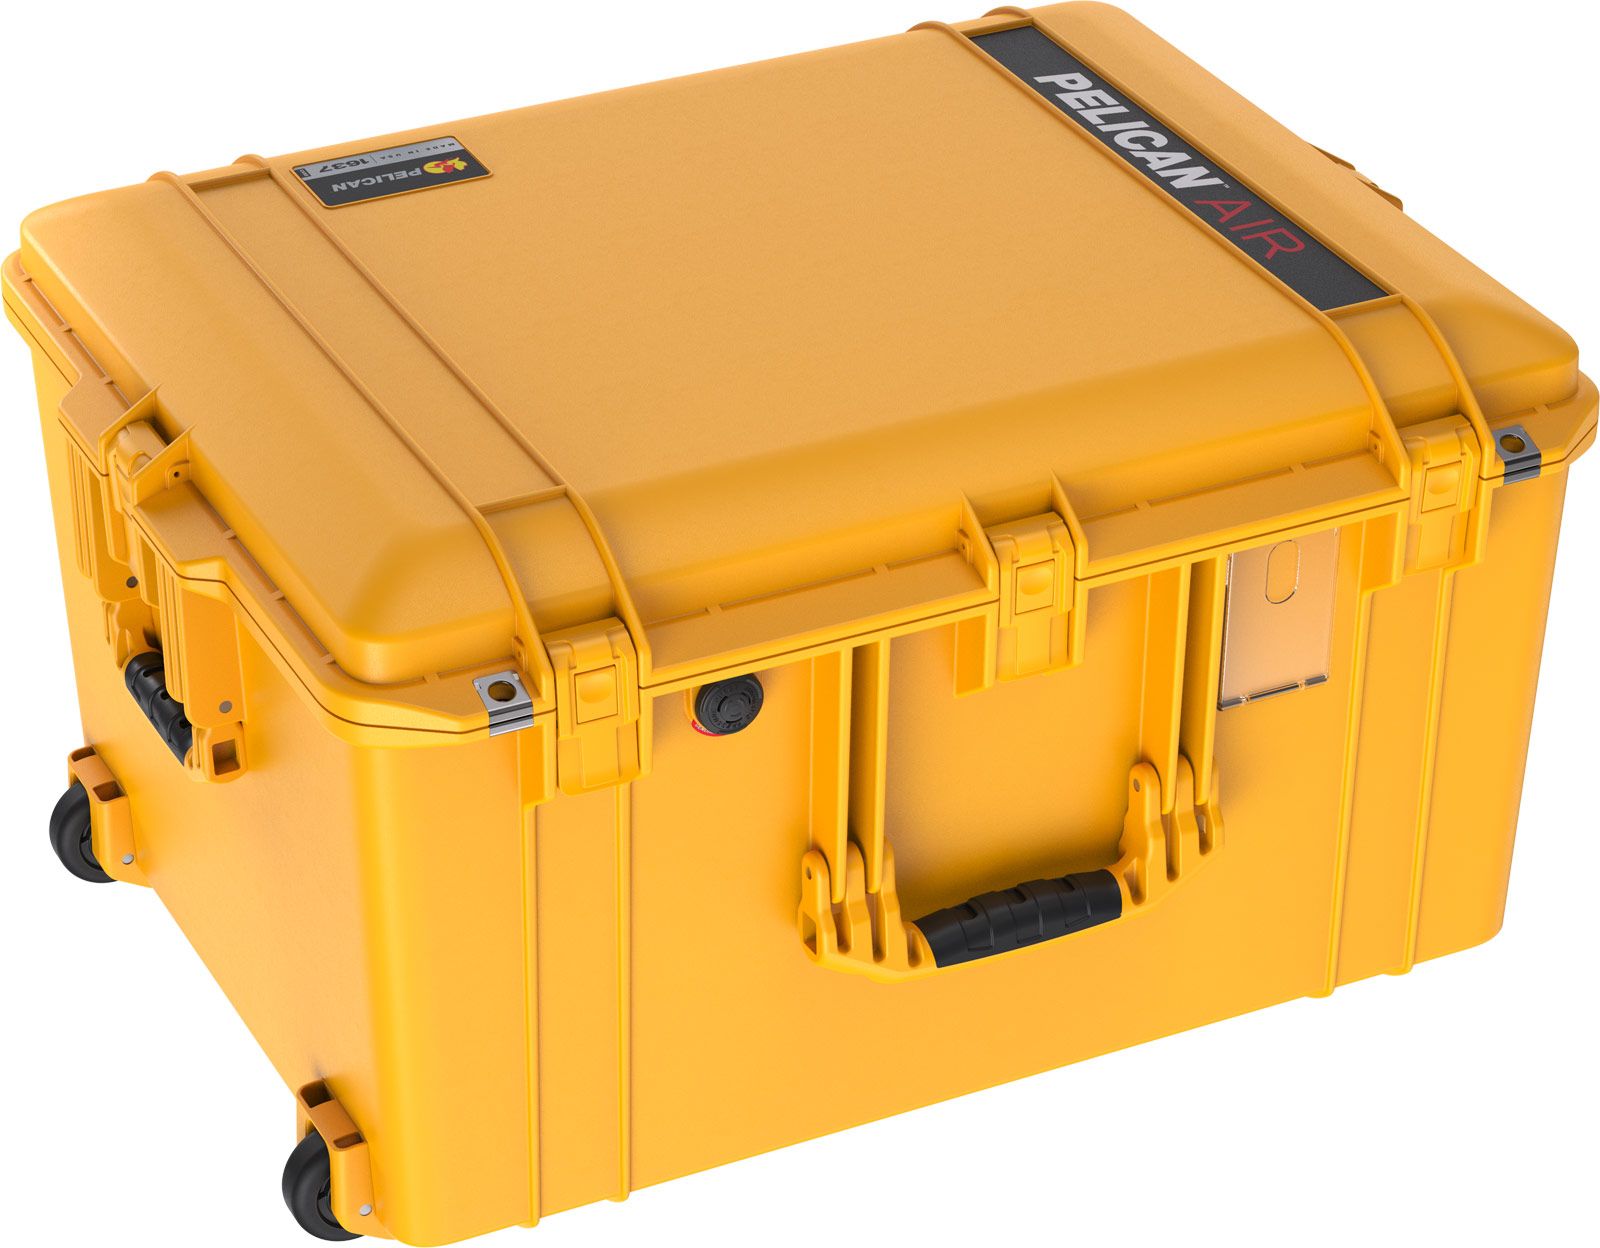 pelican 1637 case yellow air cases